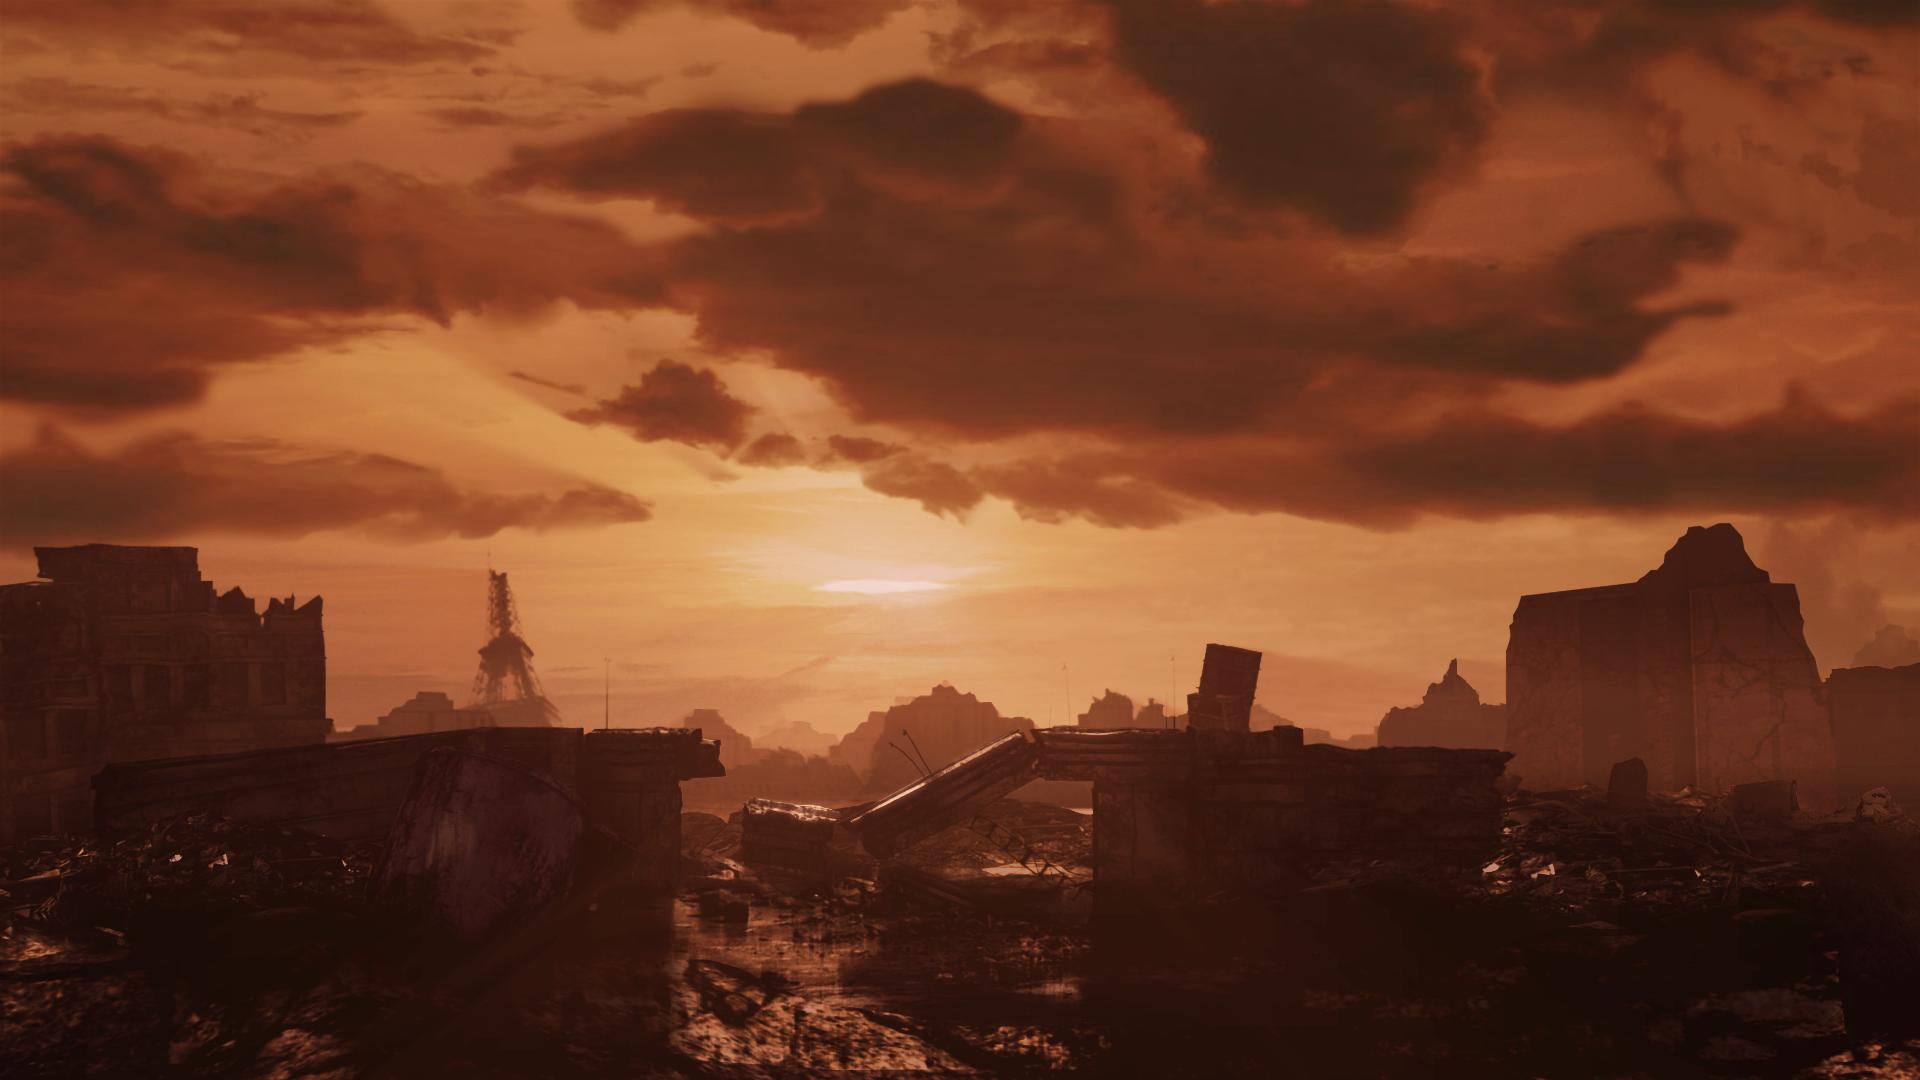 Paris post apocalypse by Zlydoc